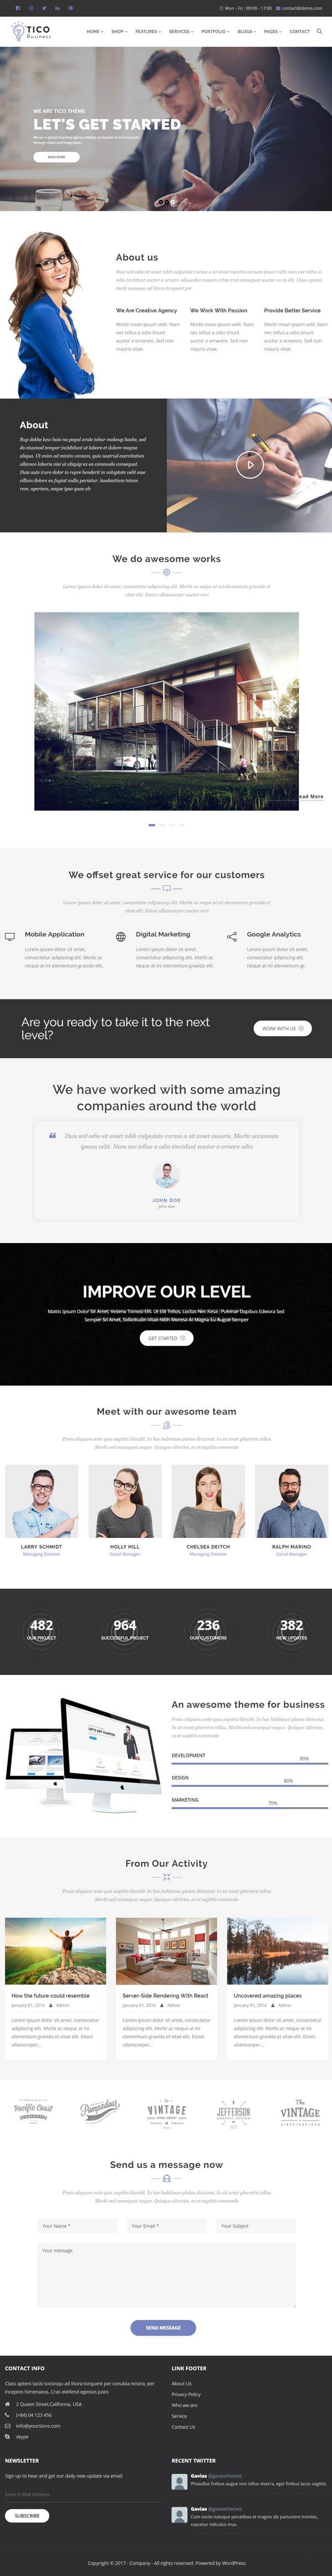 Tico – Responsive Business WordPress Theme